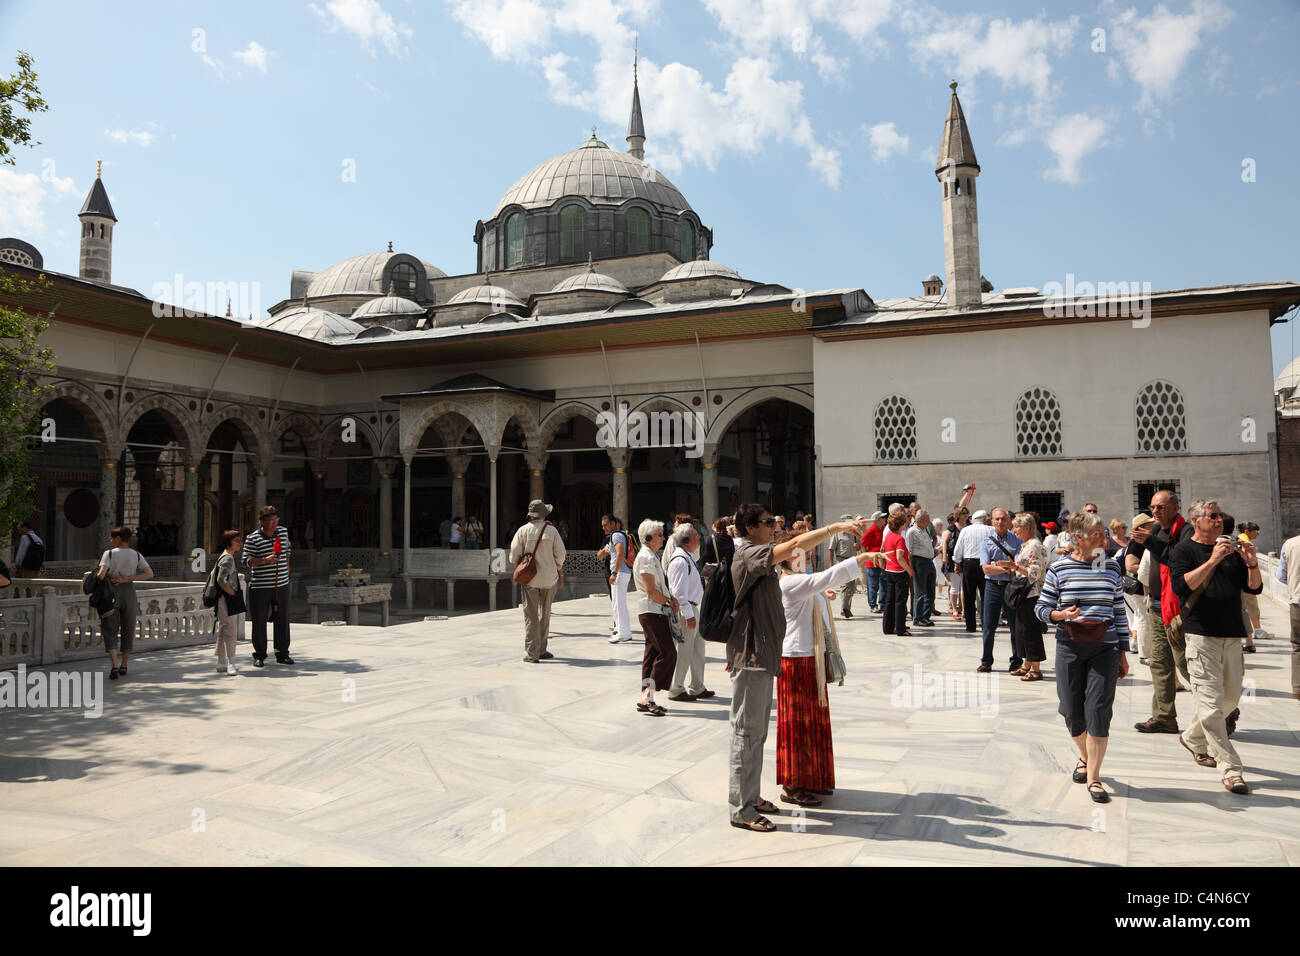 Tourists inside of the Topkapi Palace, Istanbul Turkey. Photo taken at 25th of Mai 2011 - Stock Image